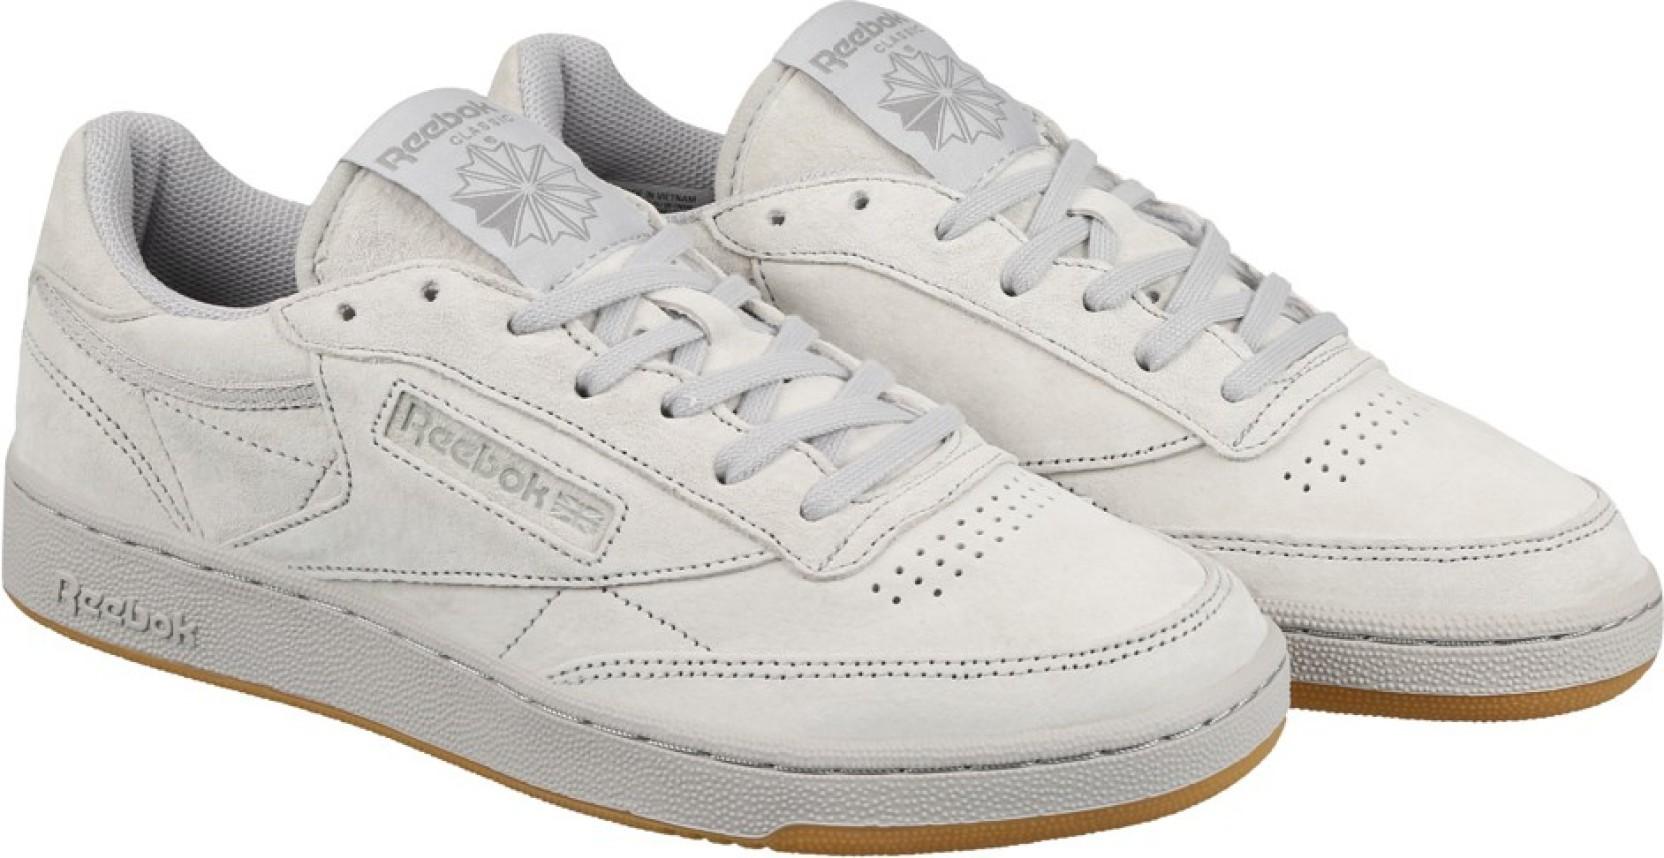 716ec0bf2c5 REEBOK CLUB C 85 TG Sneakers For Men - Buy STEEL CARBON-GUM Color ...